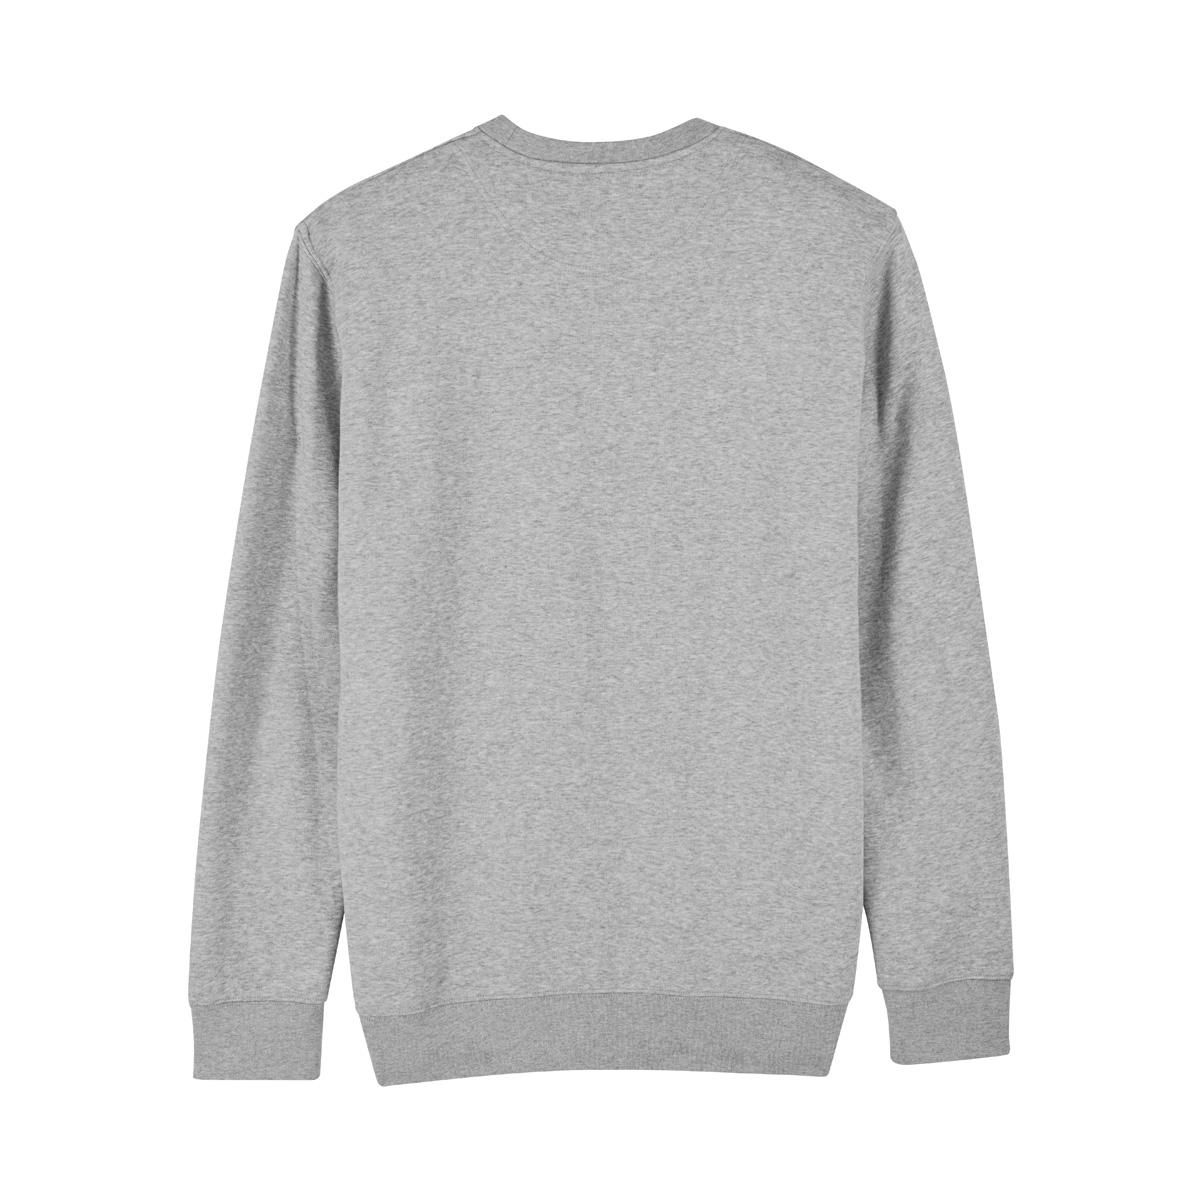 huge discount df9f3 9c337 dressgoat - Unisex Sweater - Grey